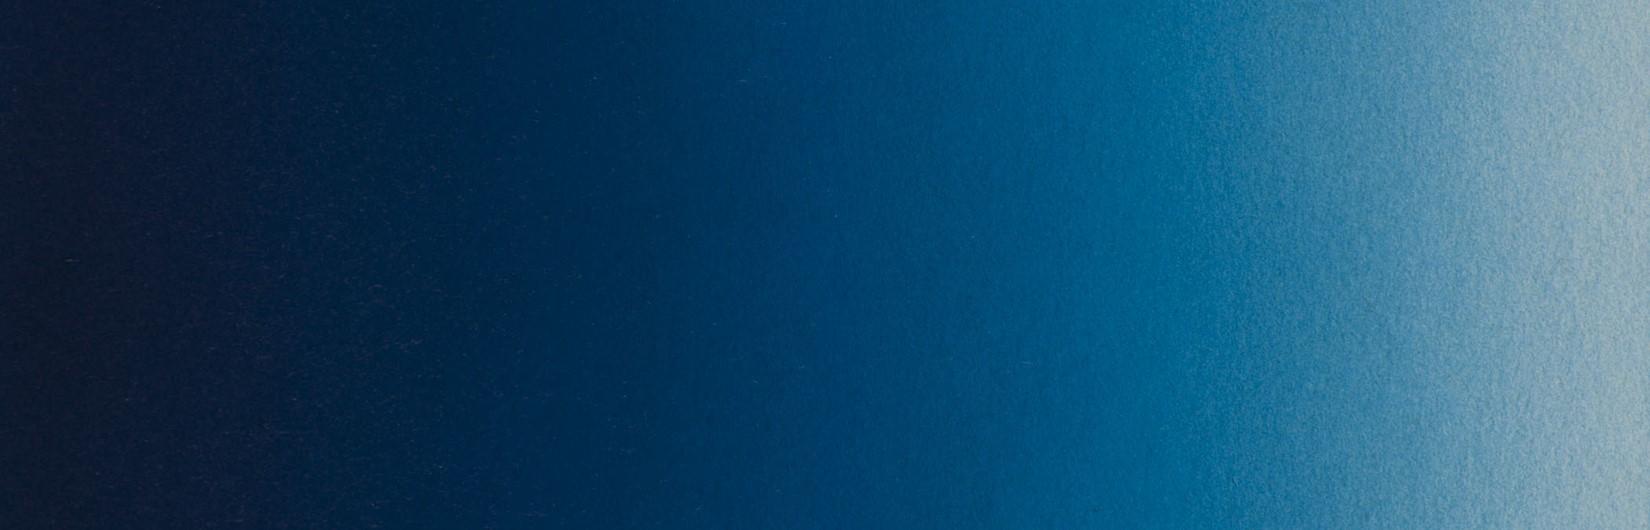 5044-createx-illustration-bloodline-code-blue.jpg